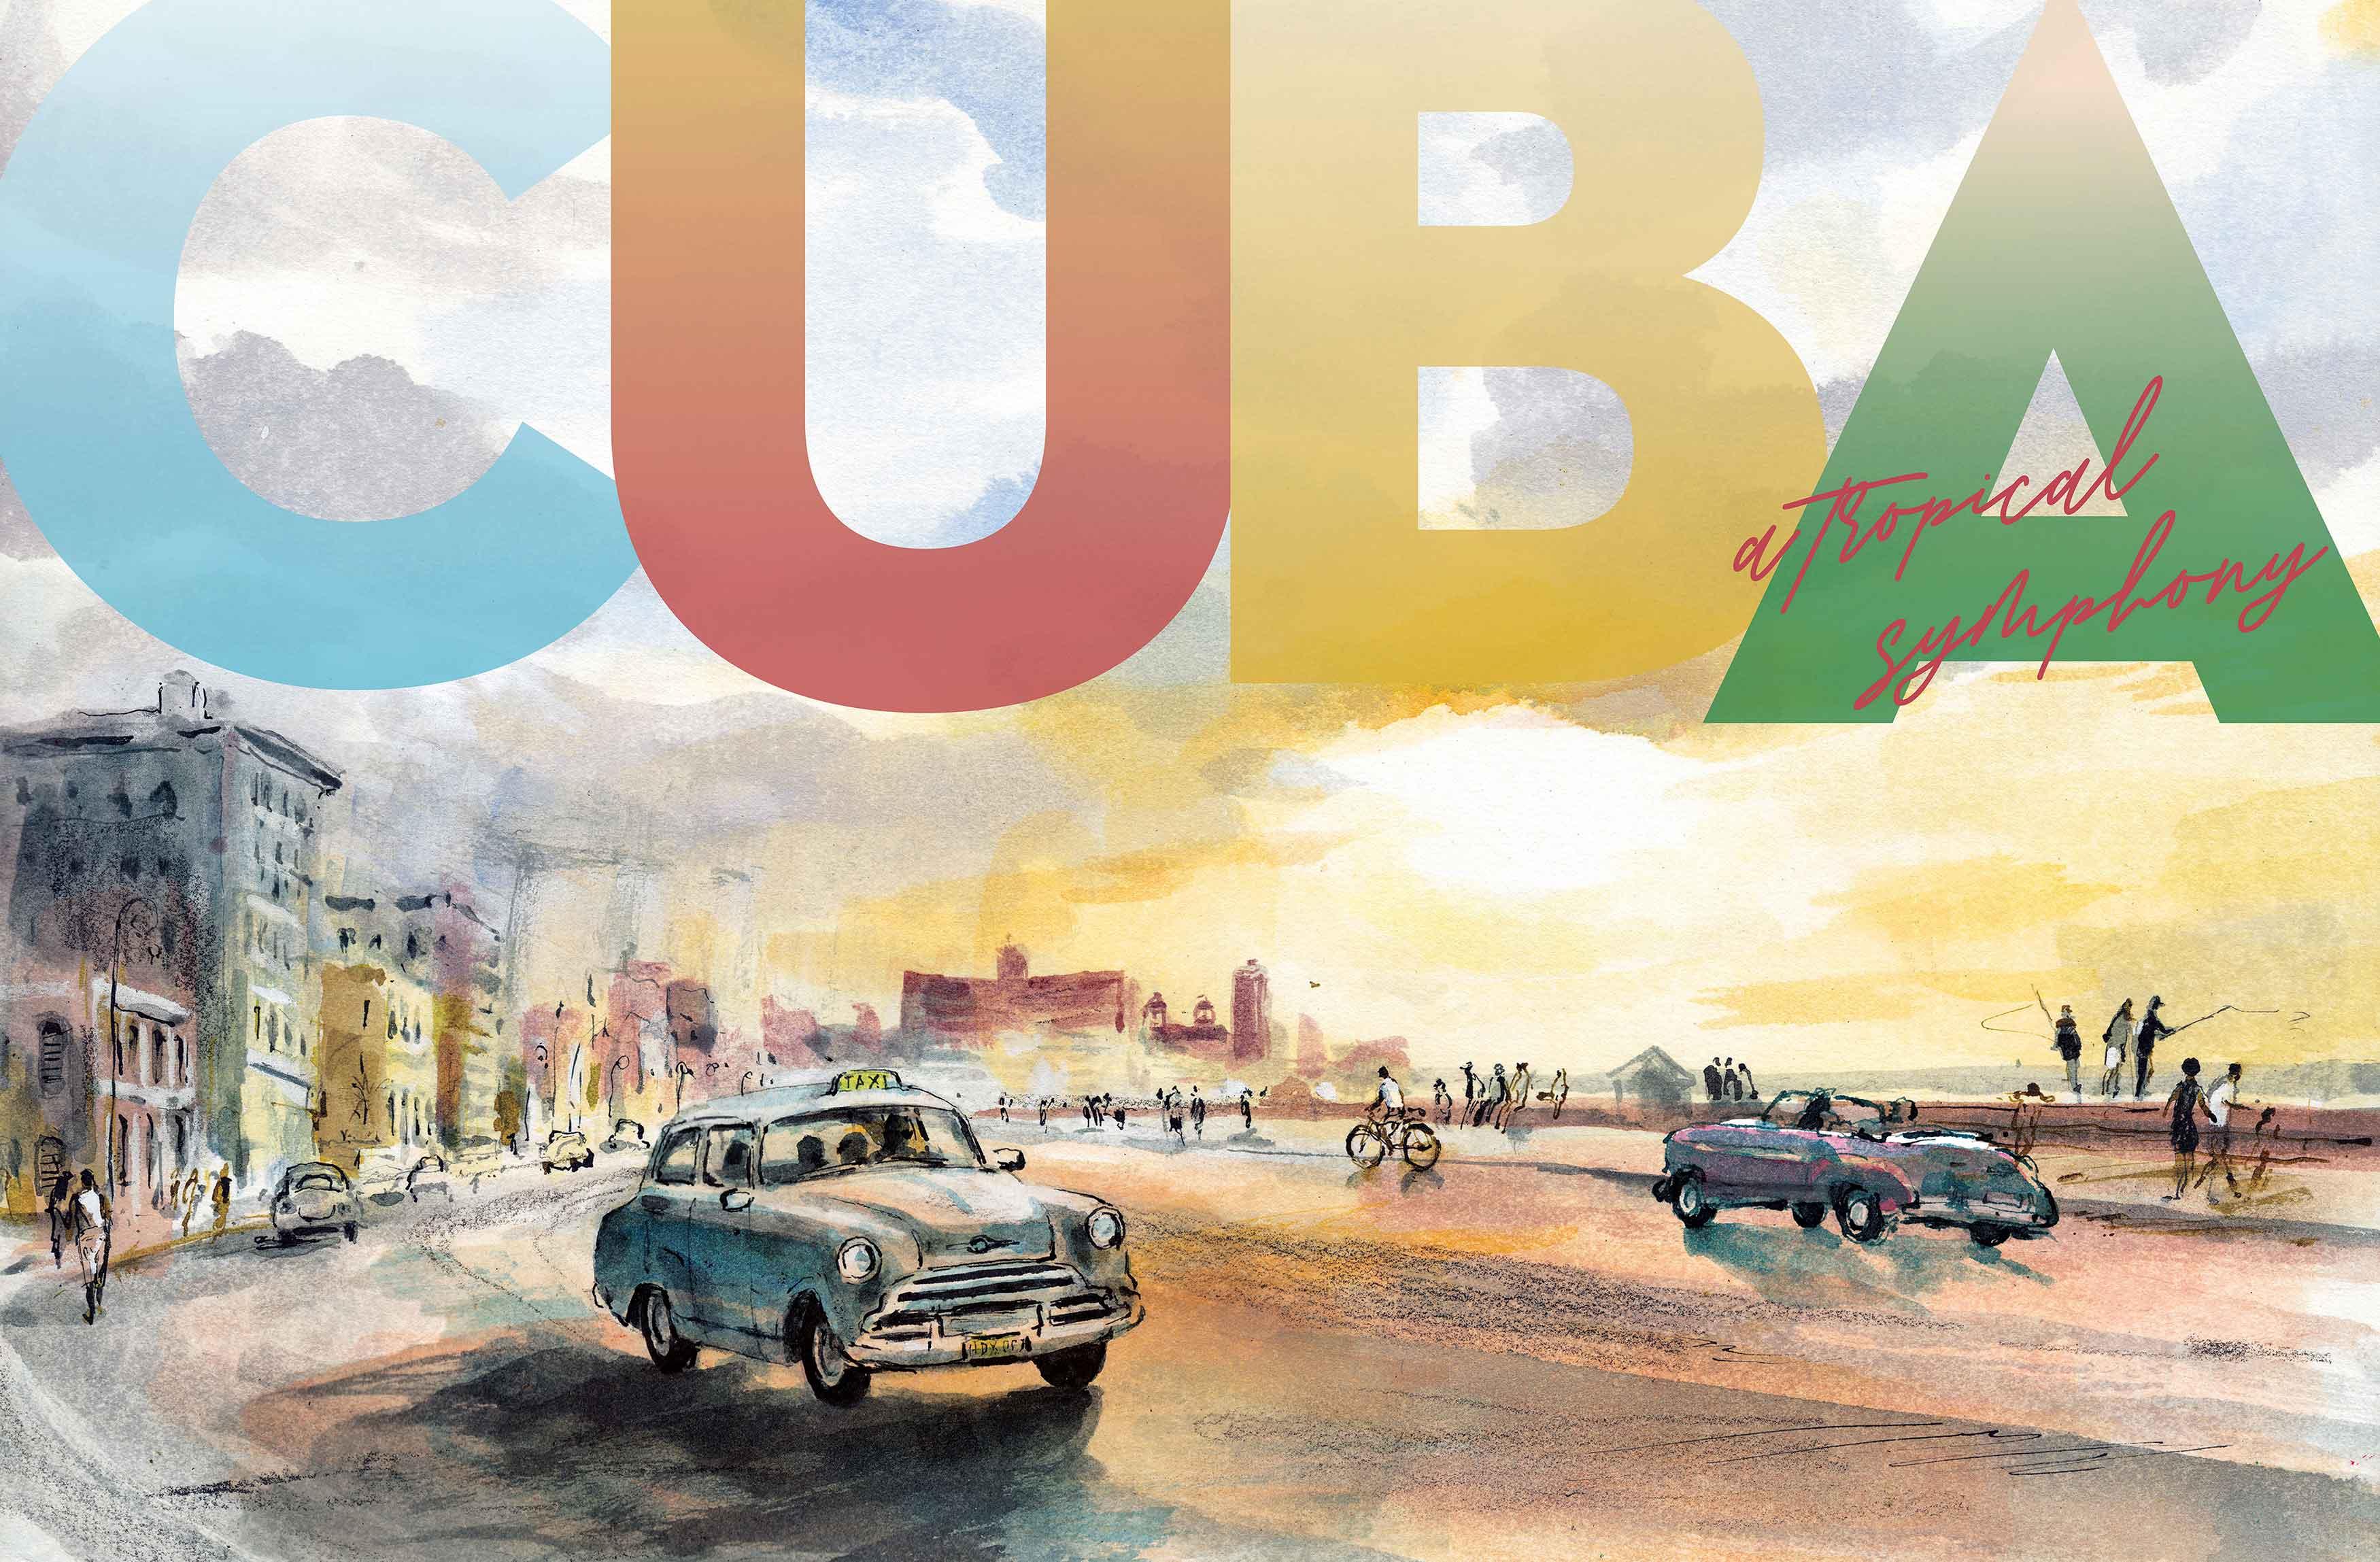 An illustration of a beach in cuba